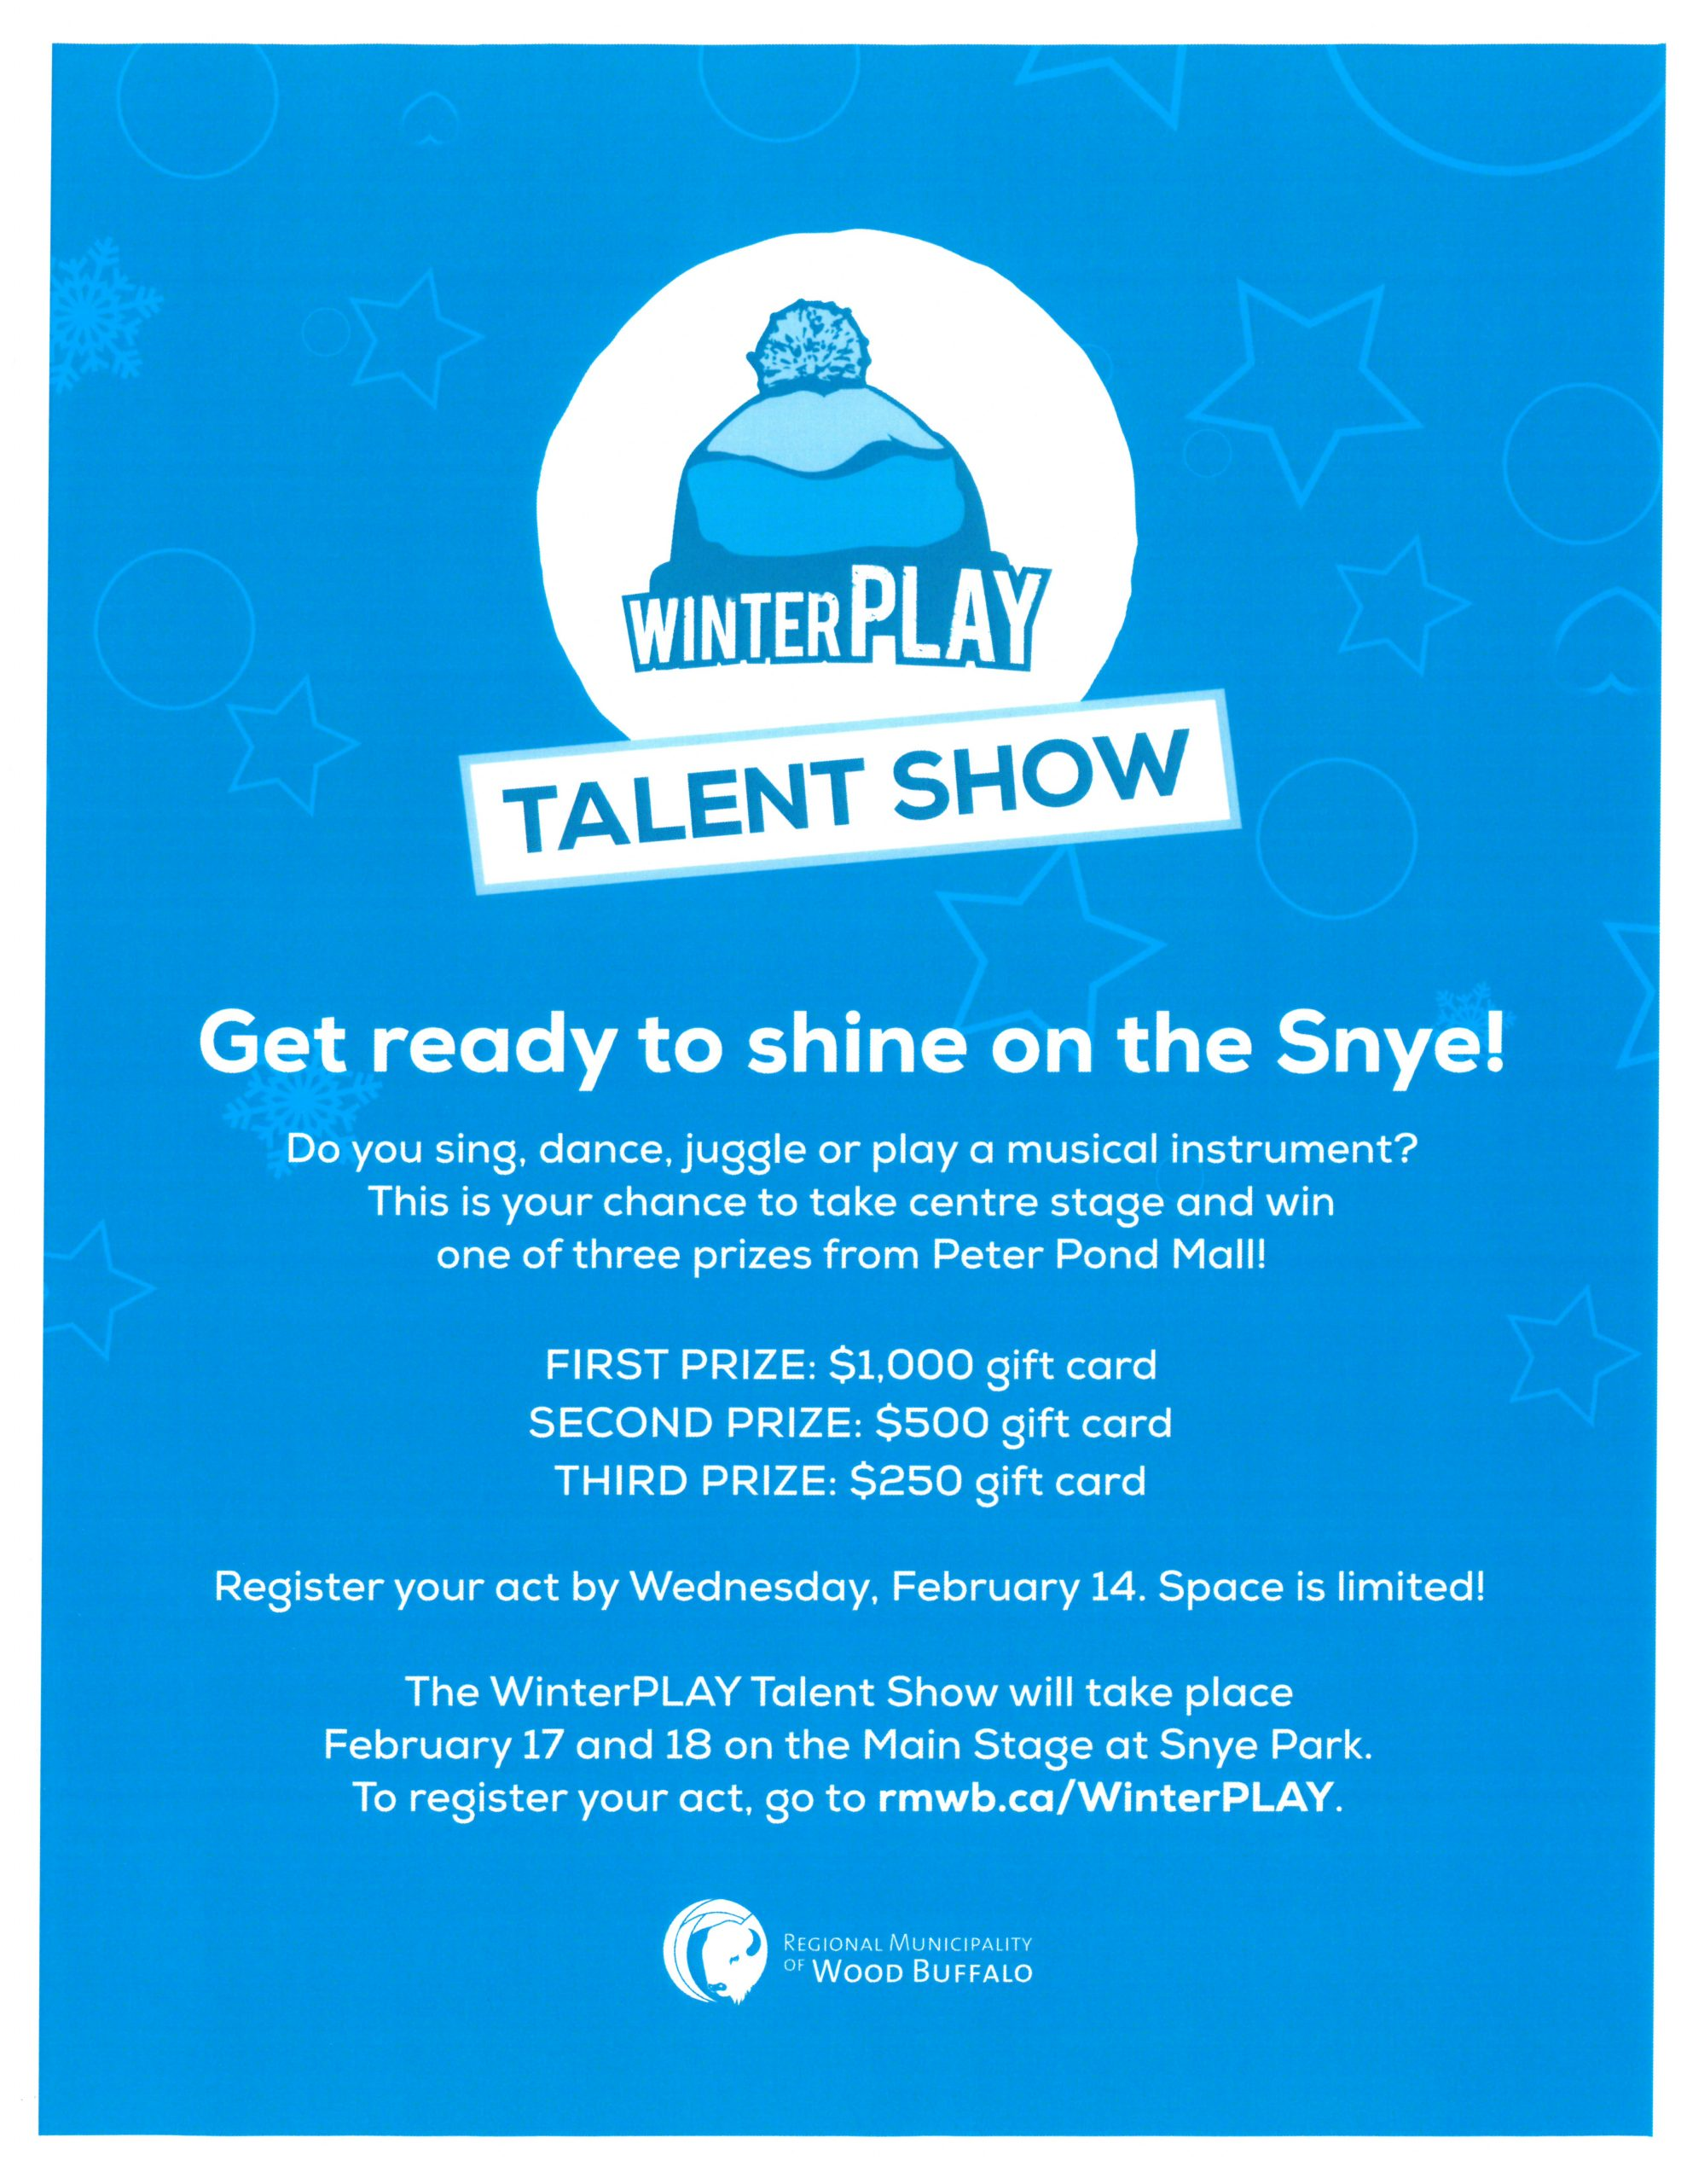 Winterplay 2018 Talent Show 100 5 Cruz Fm